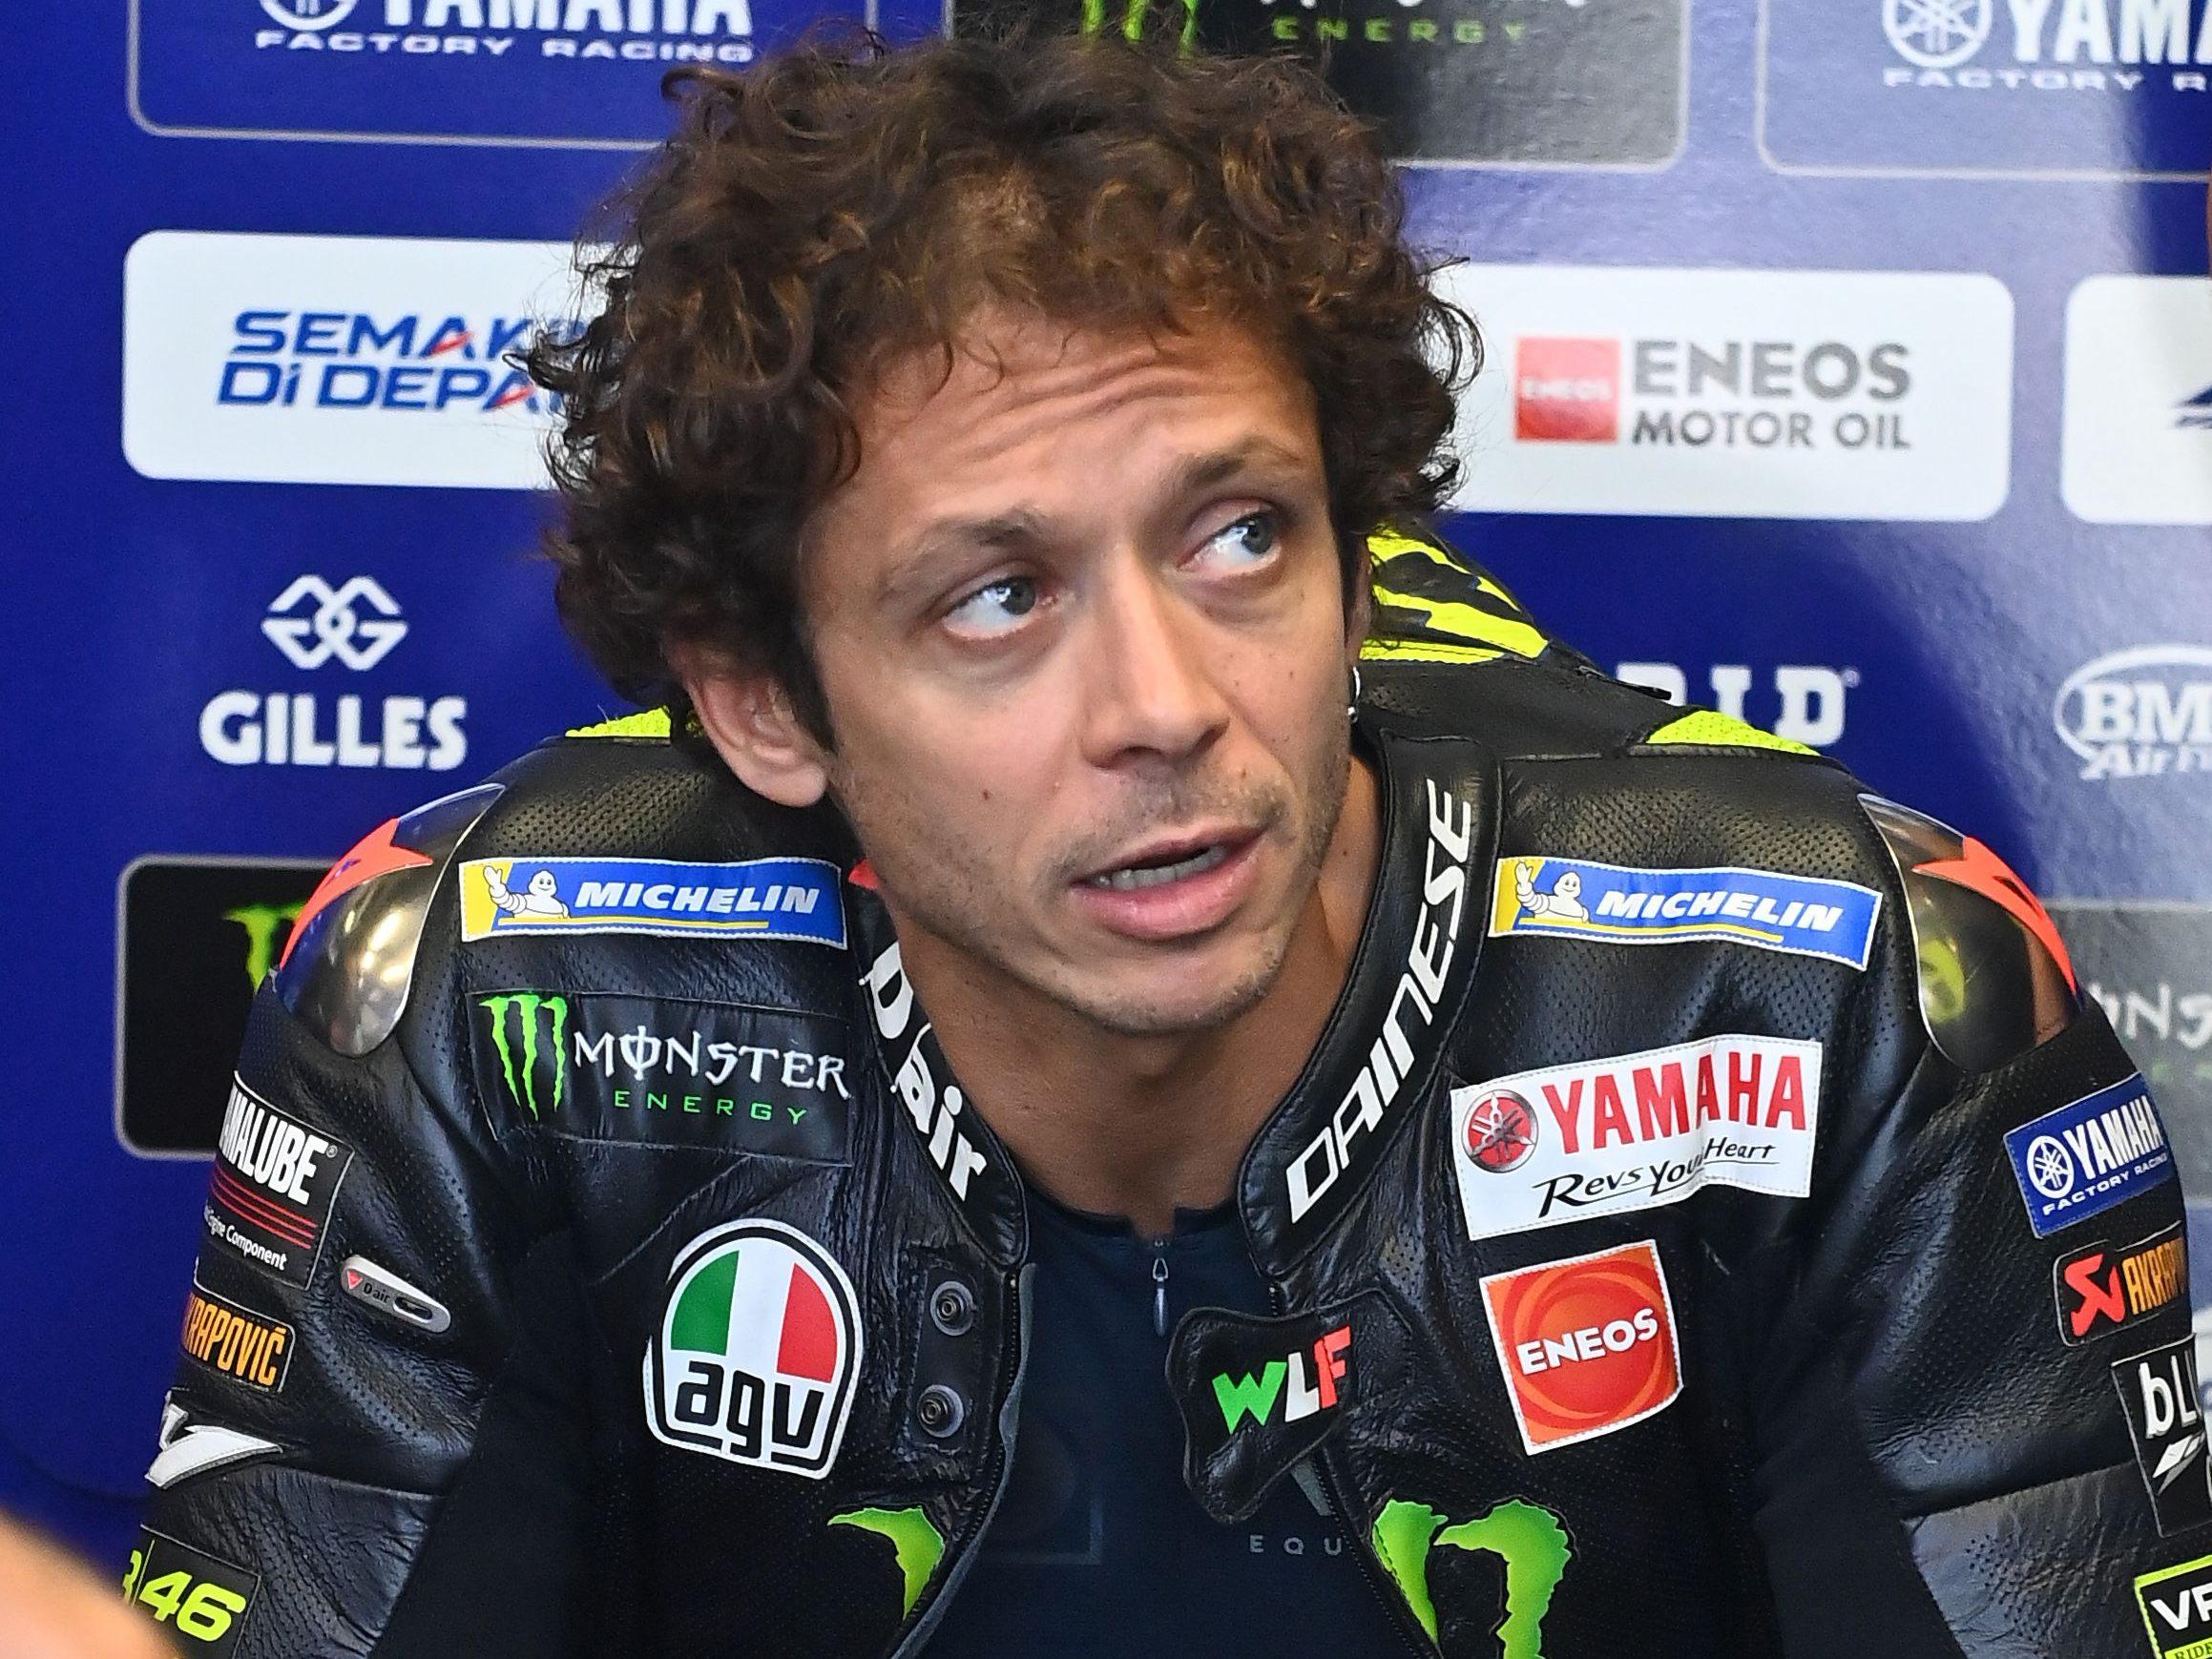 Motogp Nach Mega Crash In Spielberg Das Sagt Valentino Rossi Sport Vol At Vol At